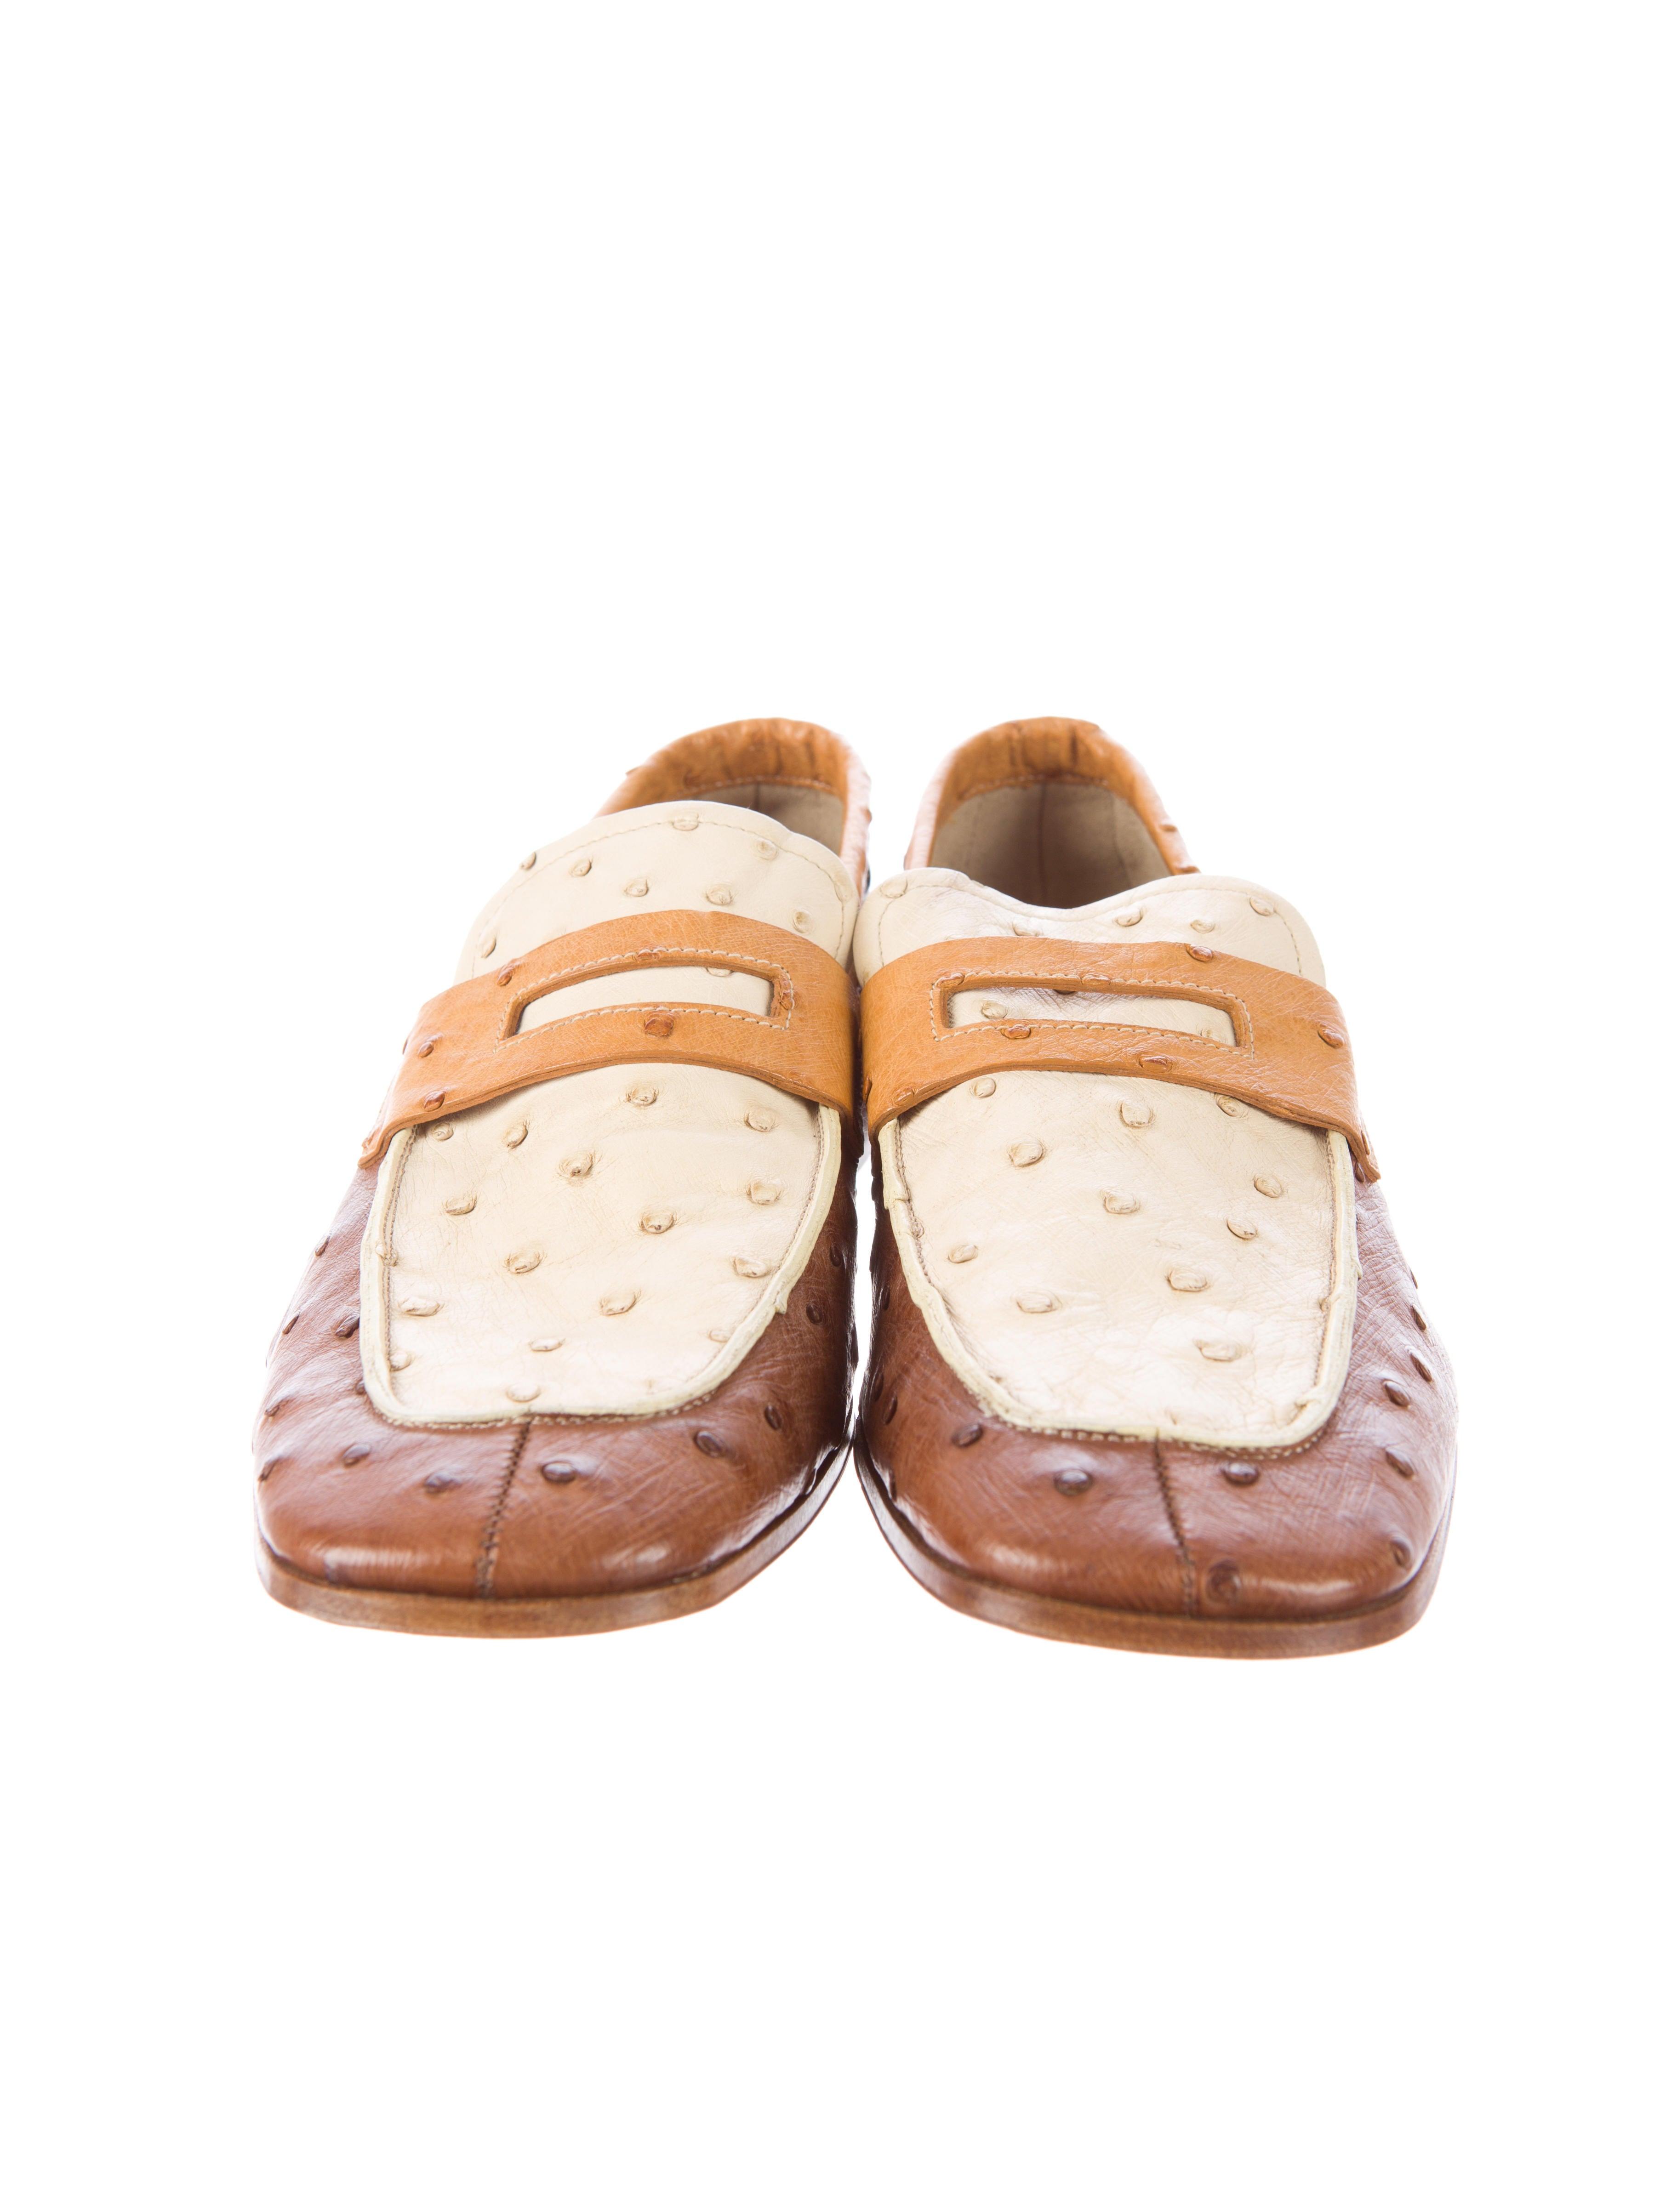 prada wristlet pouch - Prada Ostrich Loafers - Mens Shoes - PRA67370 | The RealReal